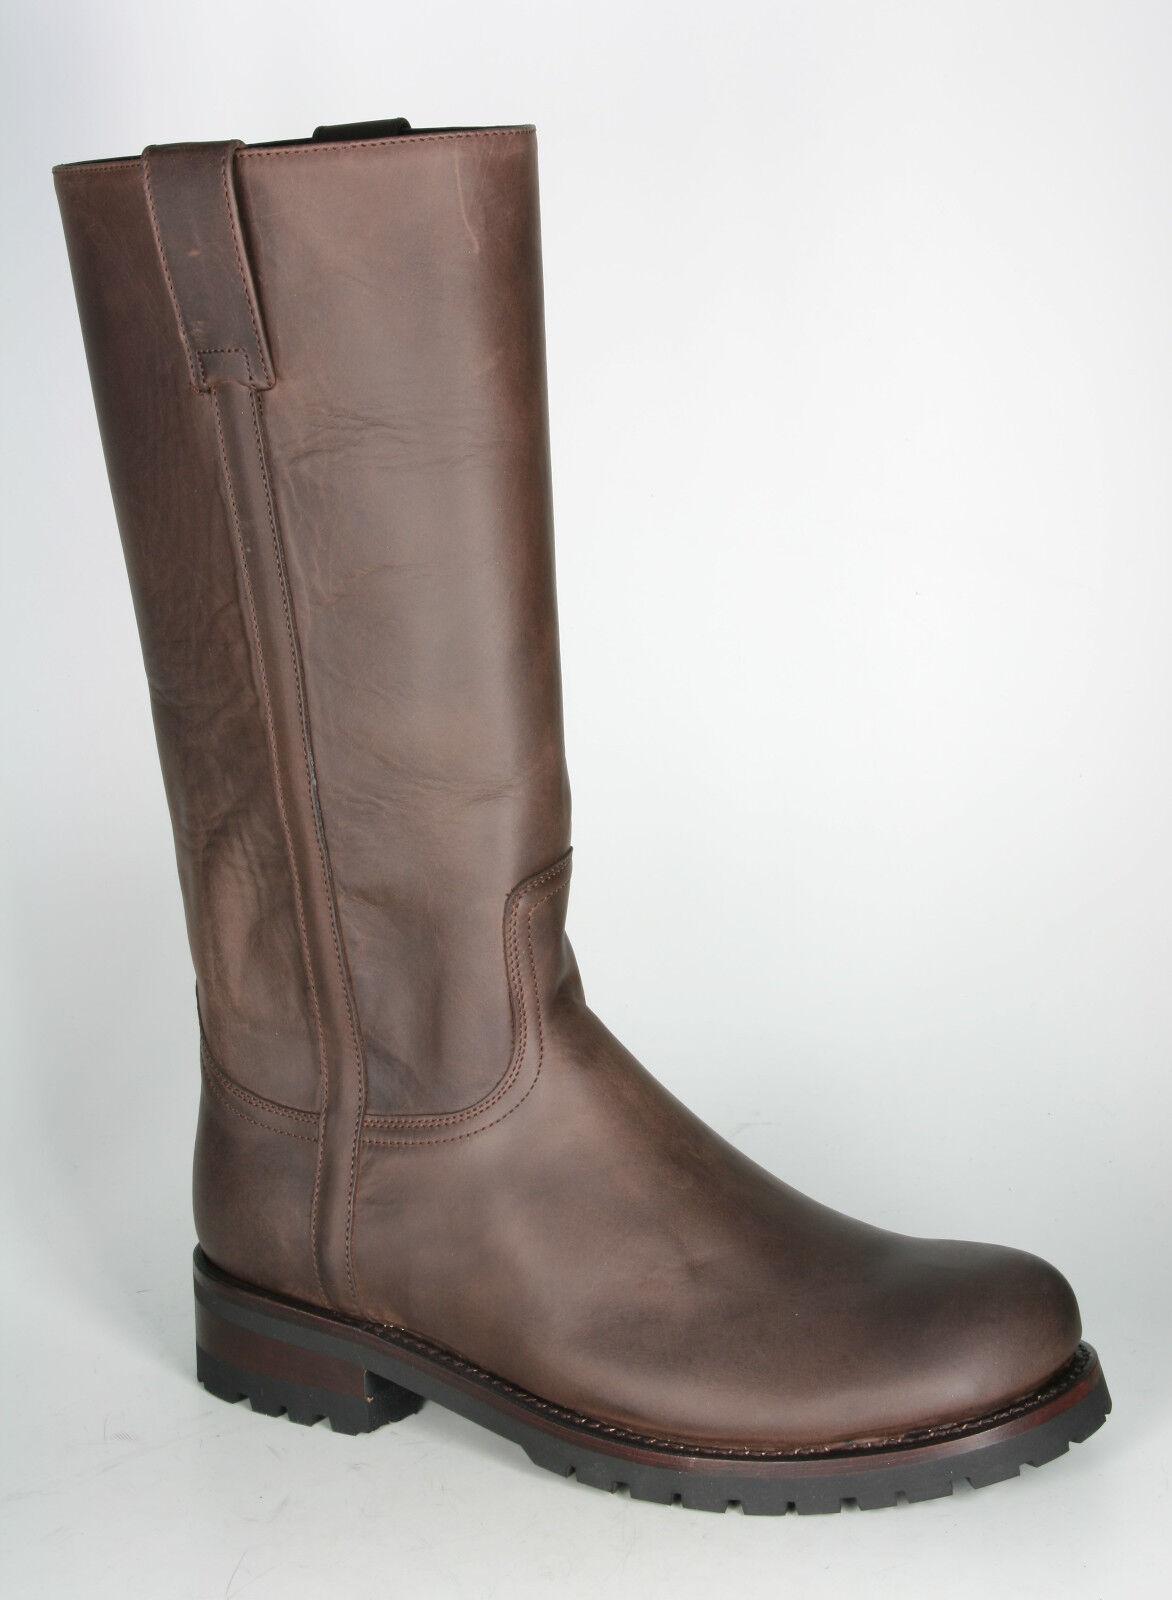 9208 Sendra Sendra Sendra Stivali m80 MAD DOG Tang Lavado Marrone MONTALA Stivali Stivali gambale alto a1ebcd